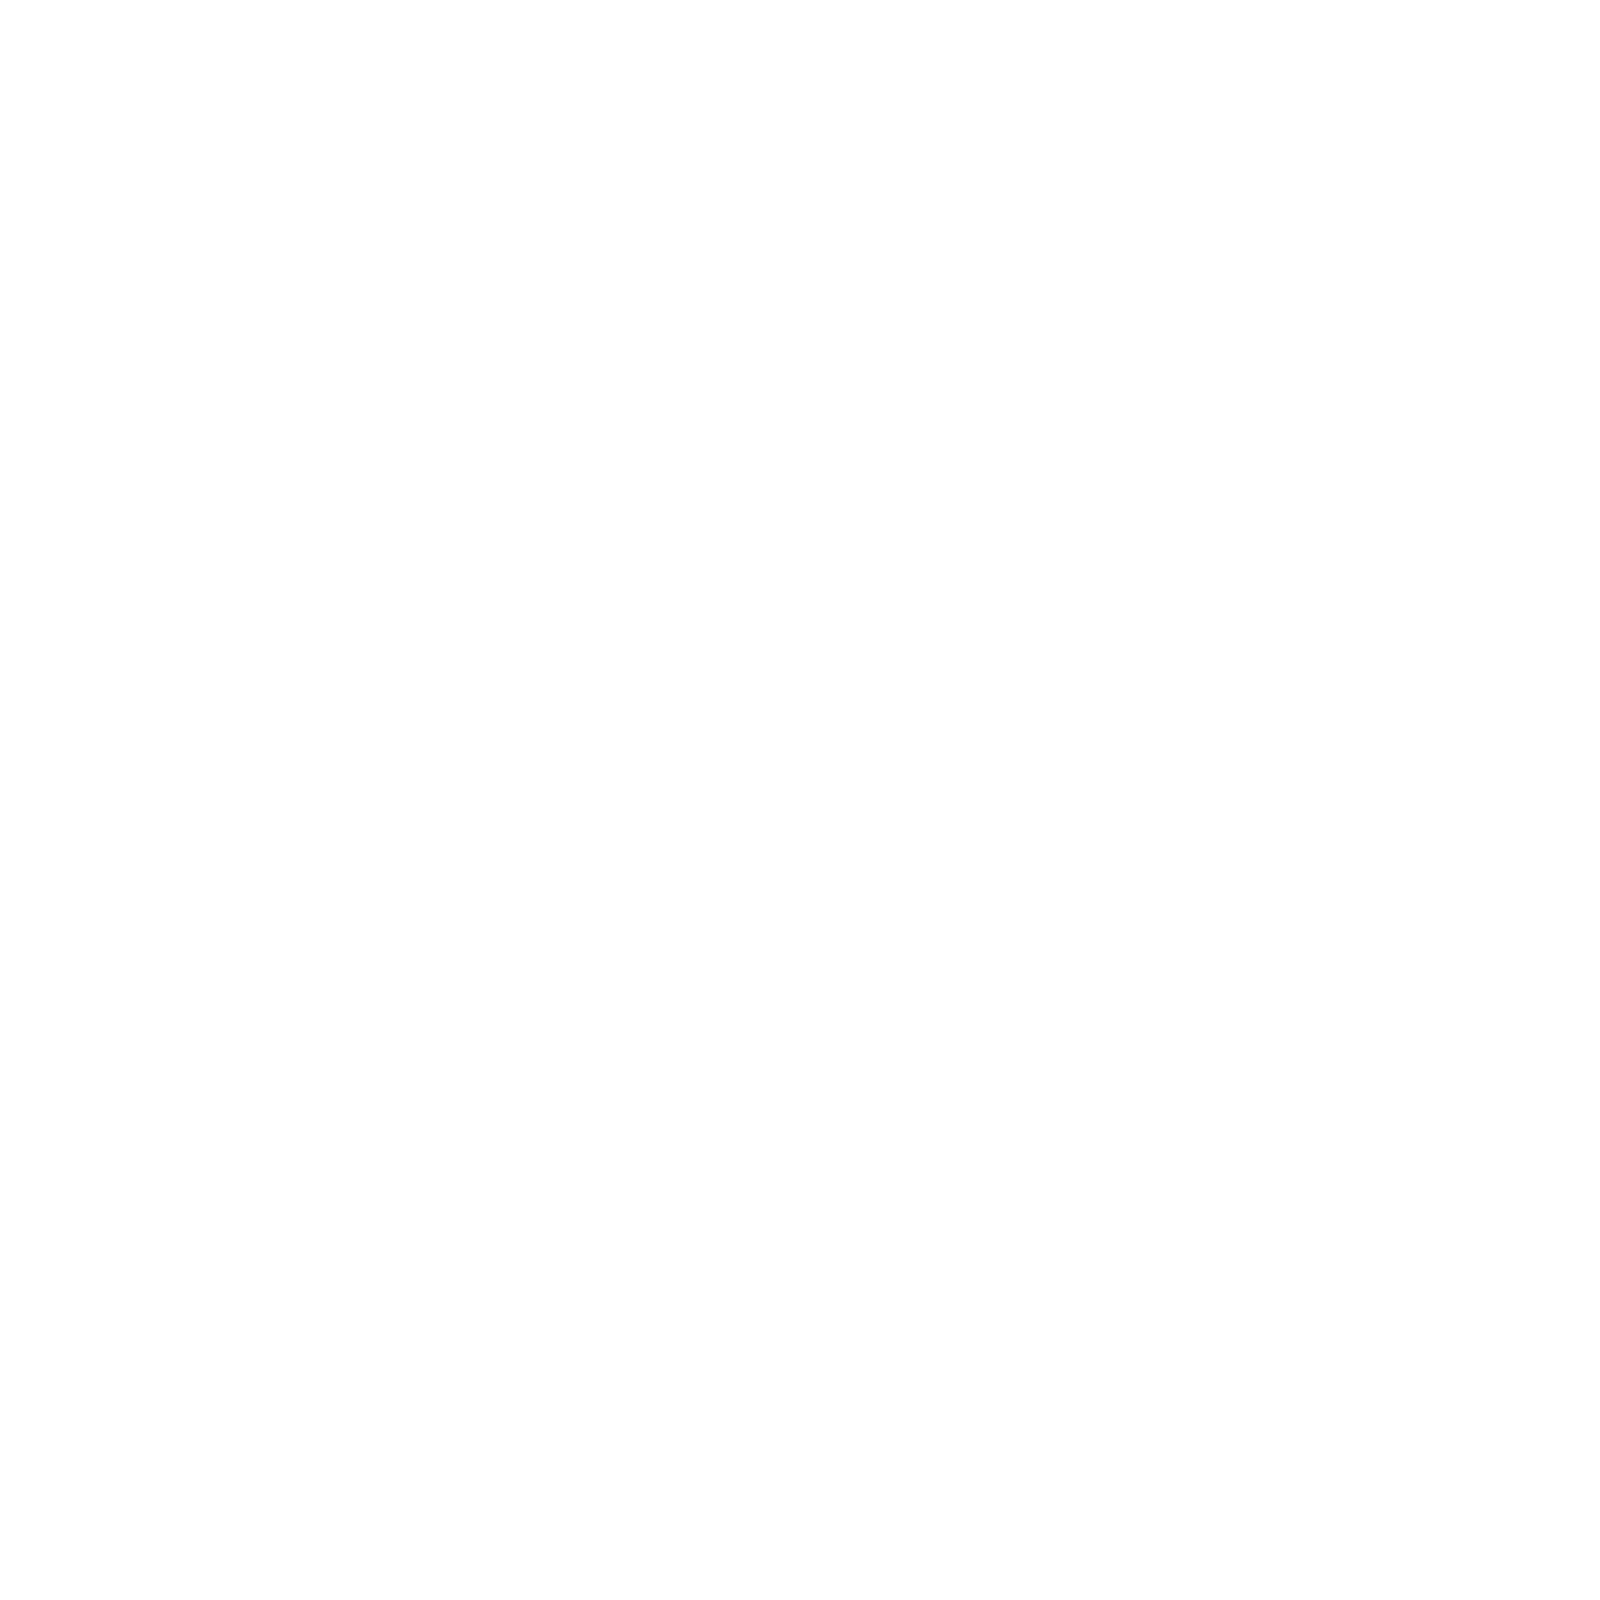 digital-barriers-project-logo